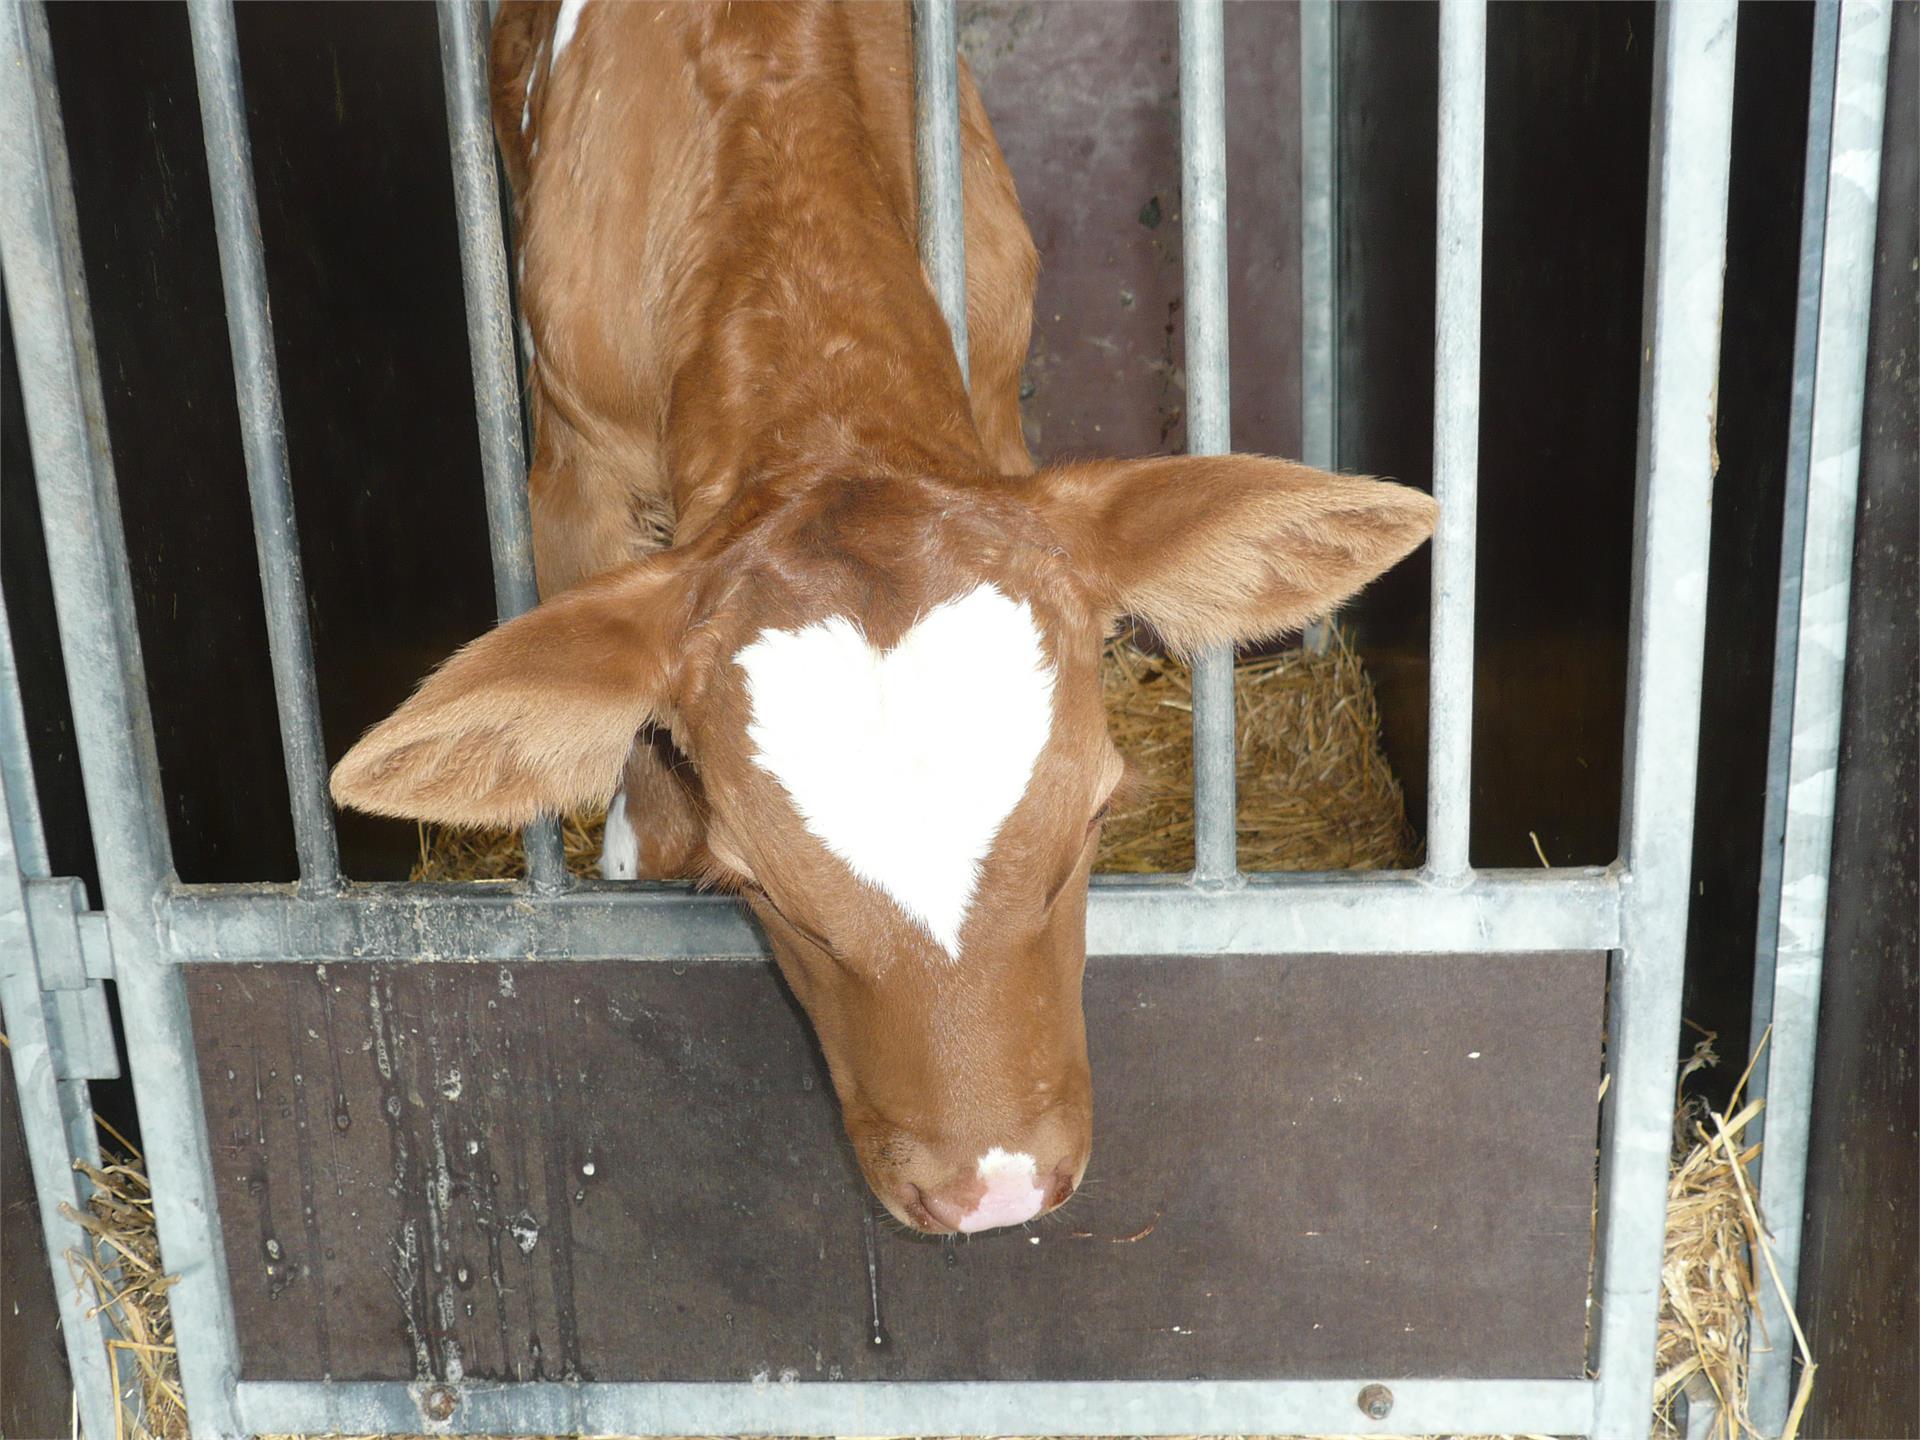 little calf Rosa- Funtnatscherhof, Fié allo Sciliar